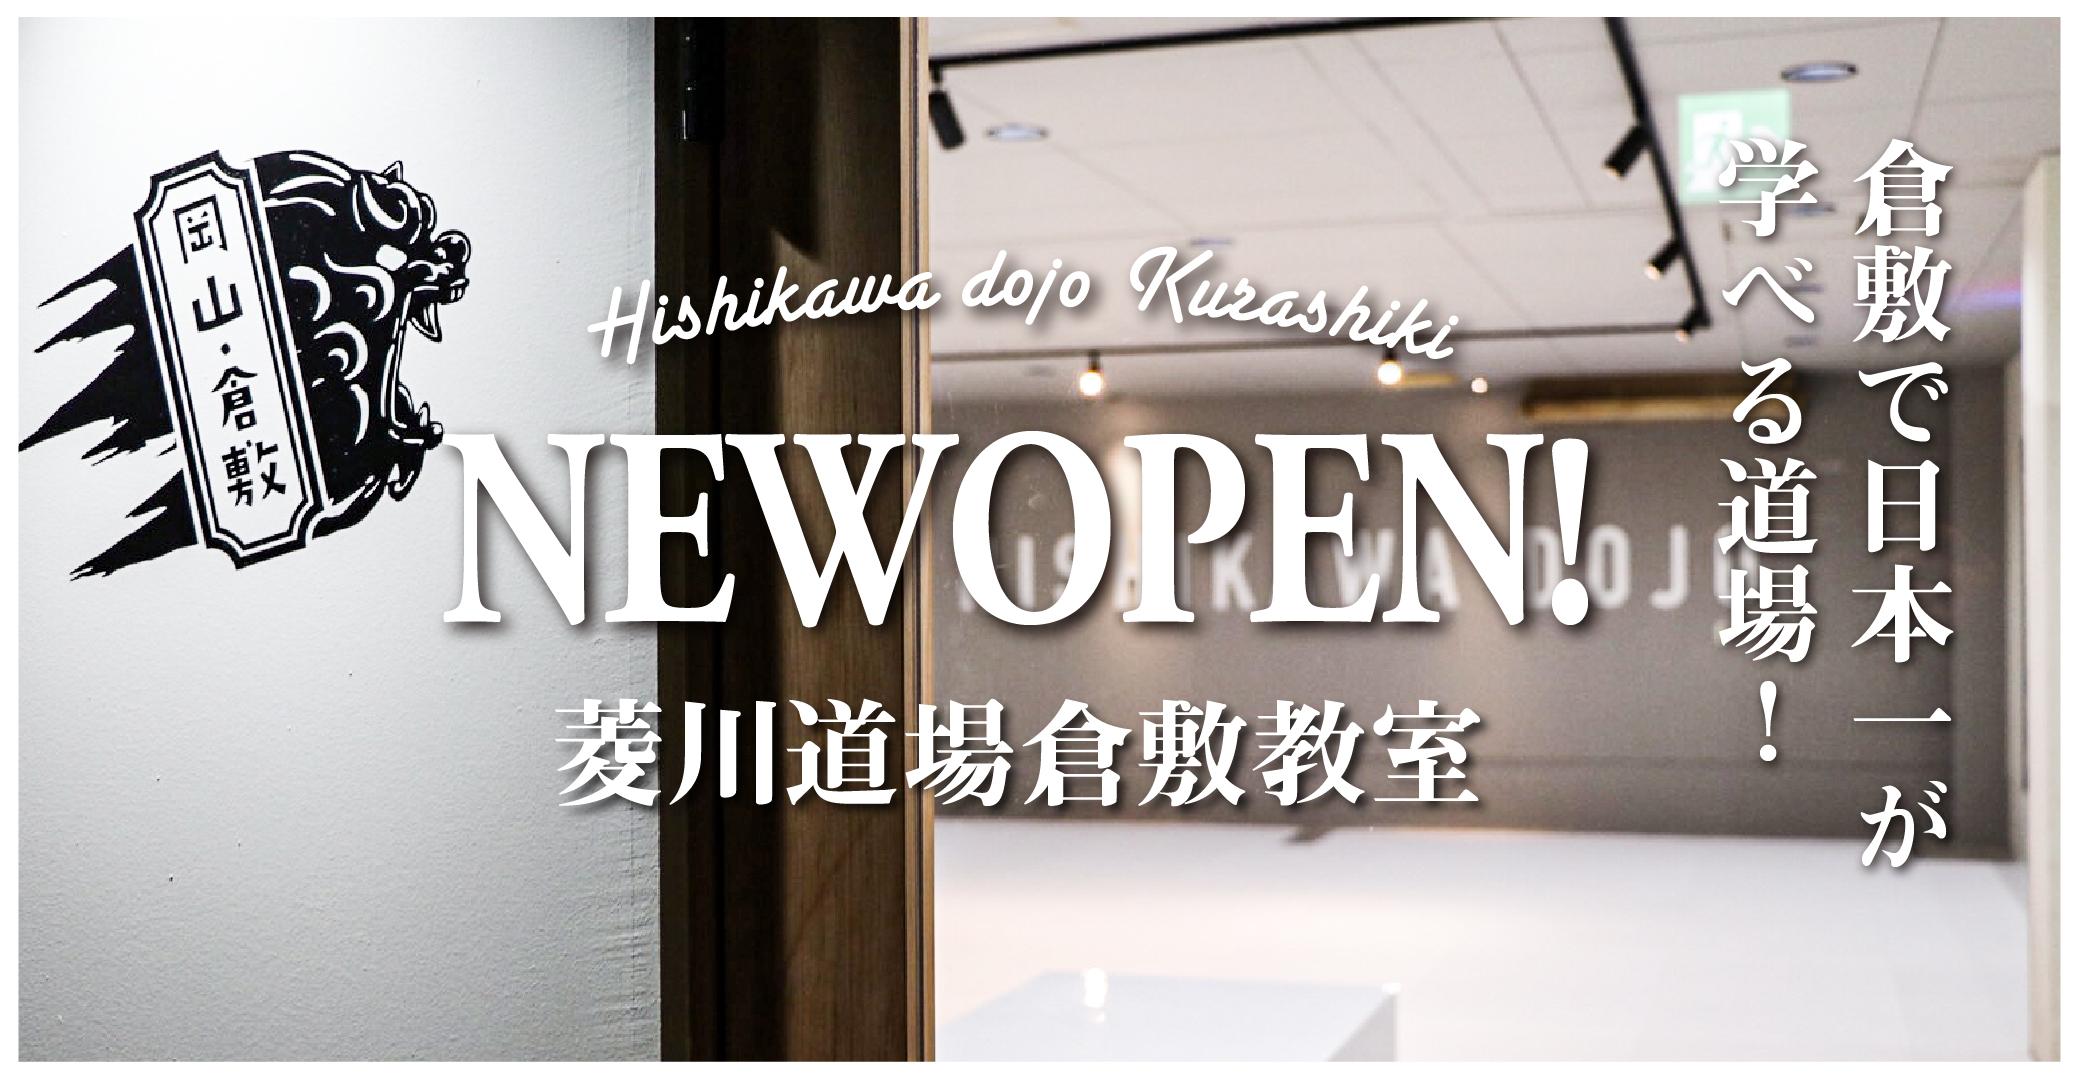 NEW OPEN!菱川道場倉敷教室 倉敷で日本一が学べる道場!